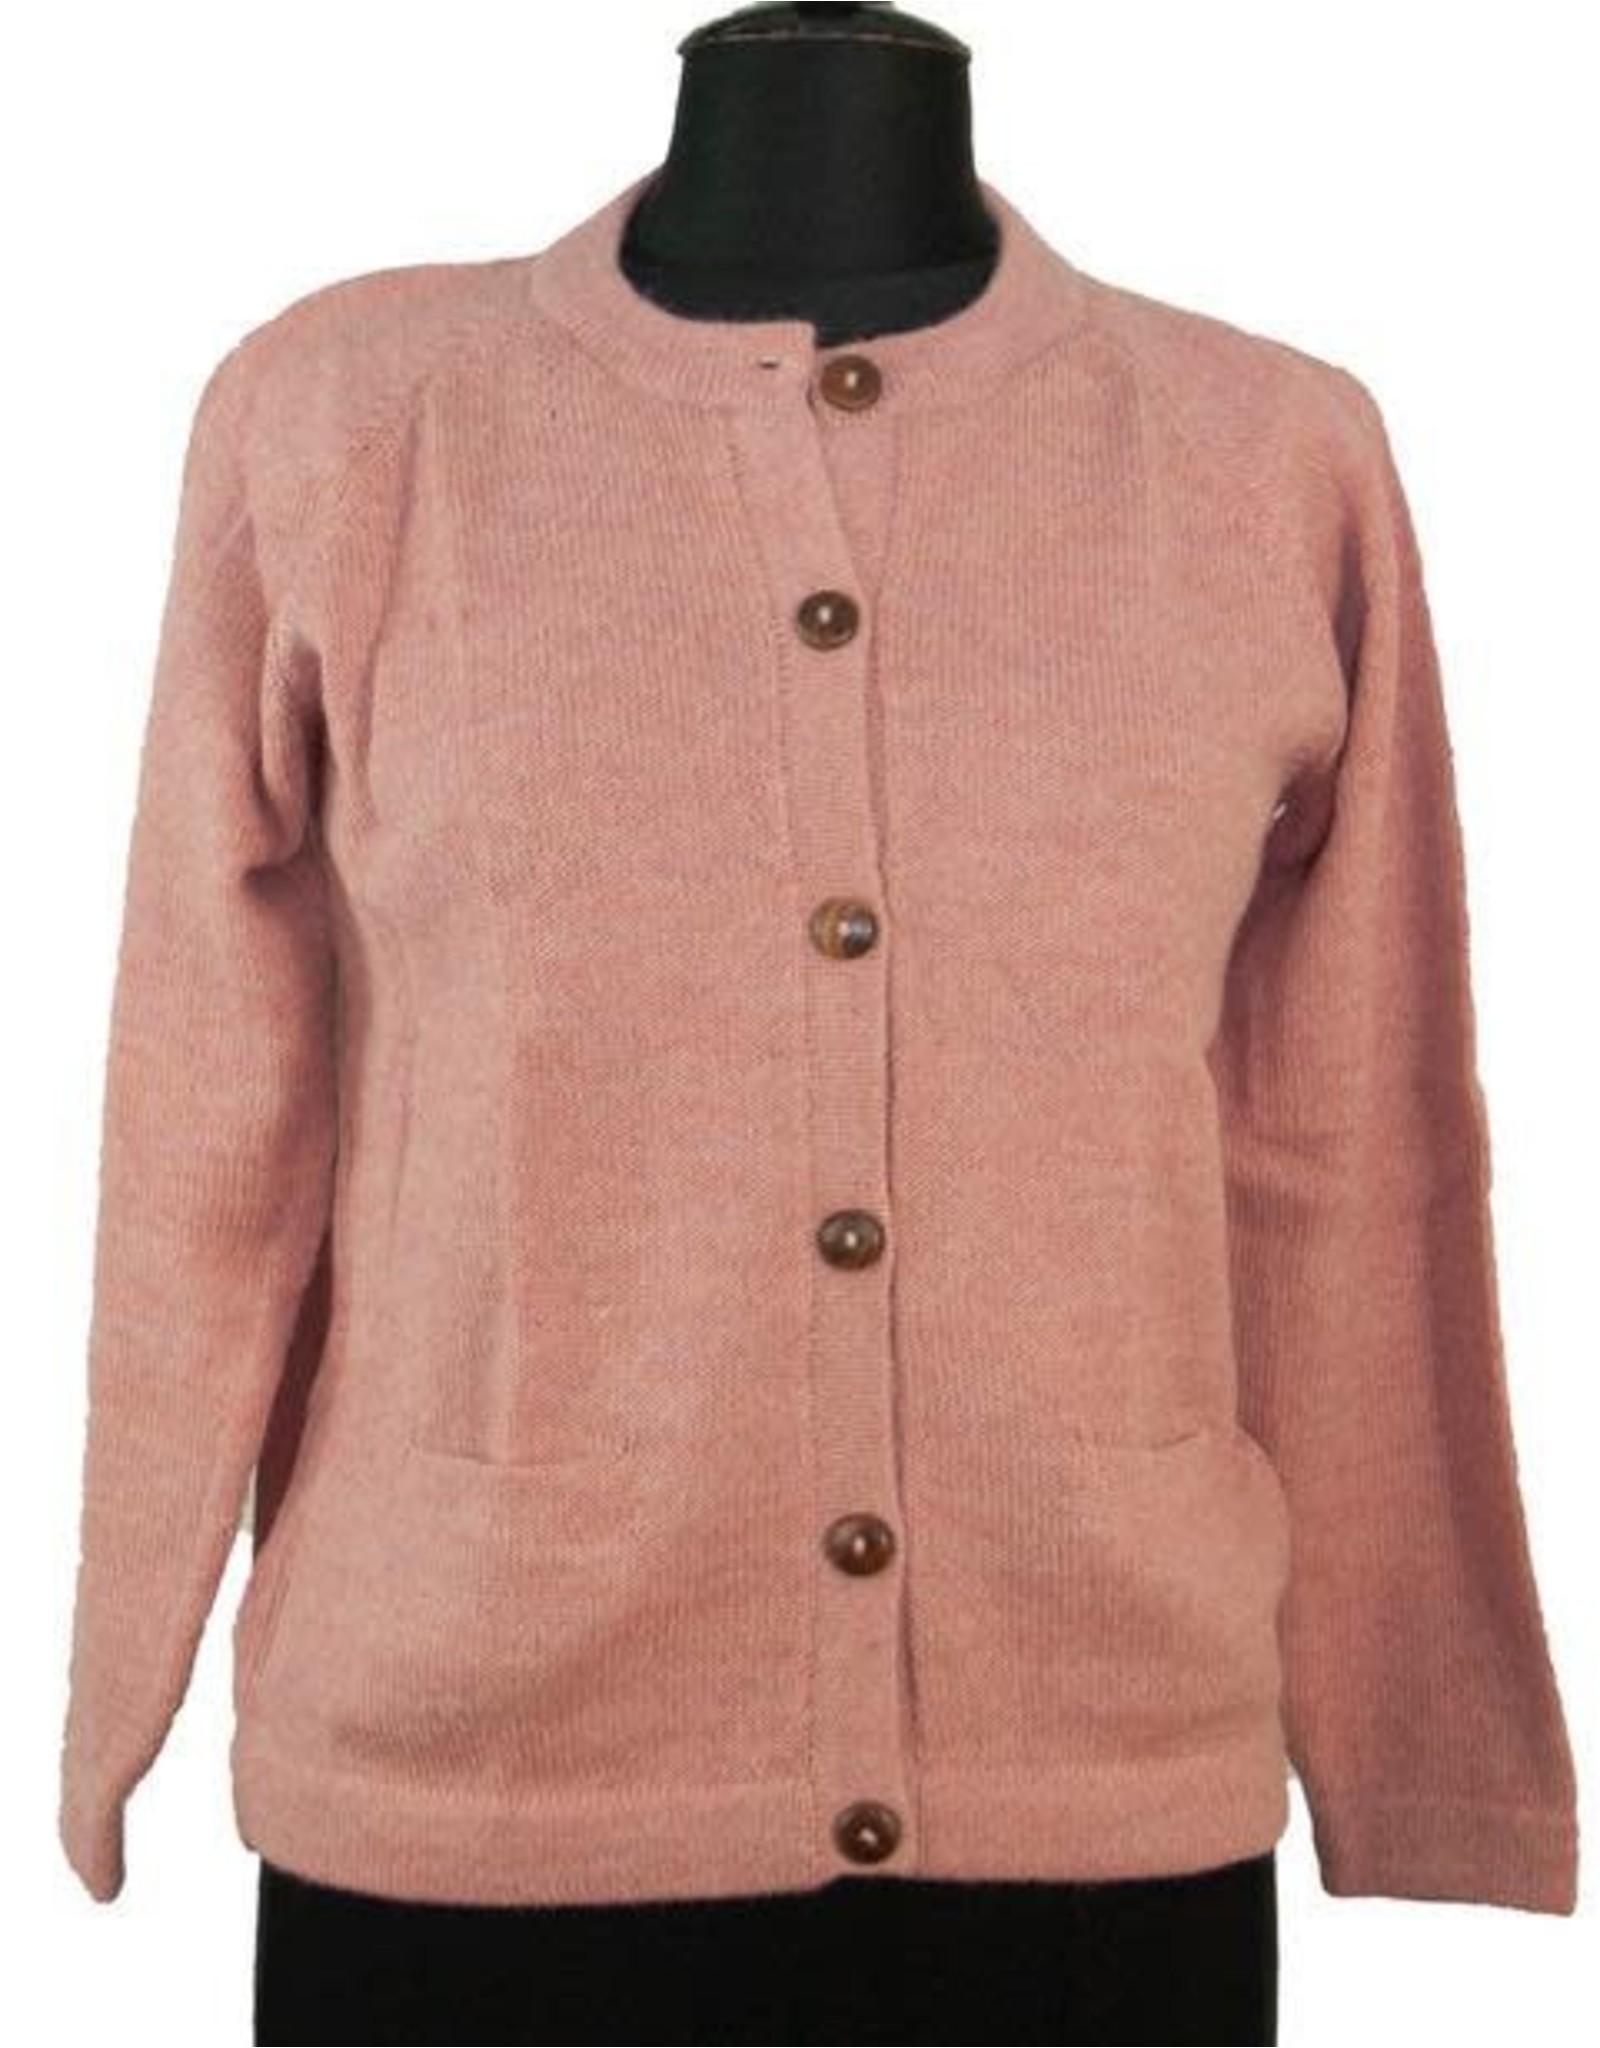 The Sweater Venture Alpaca Crew Neck Cardigan for Women